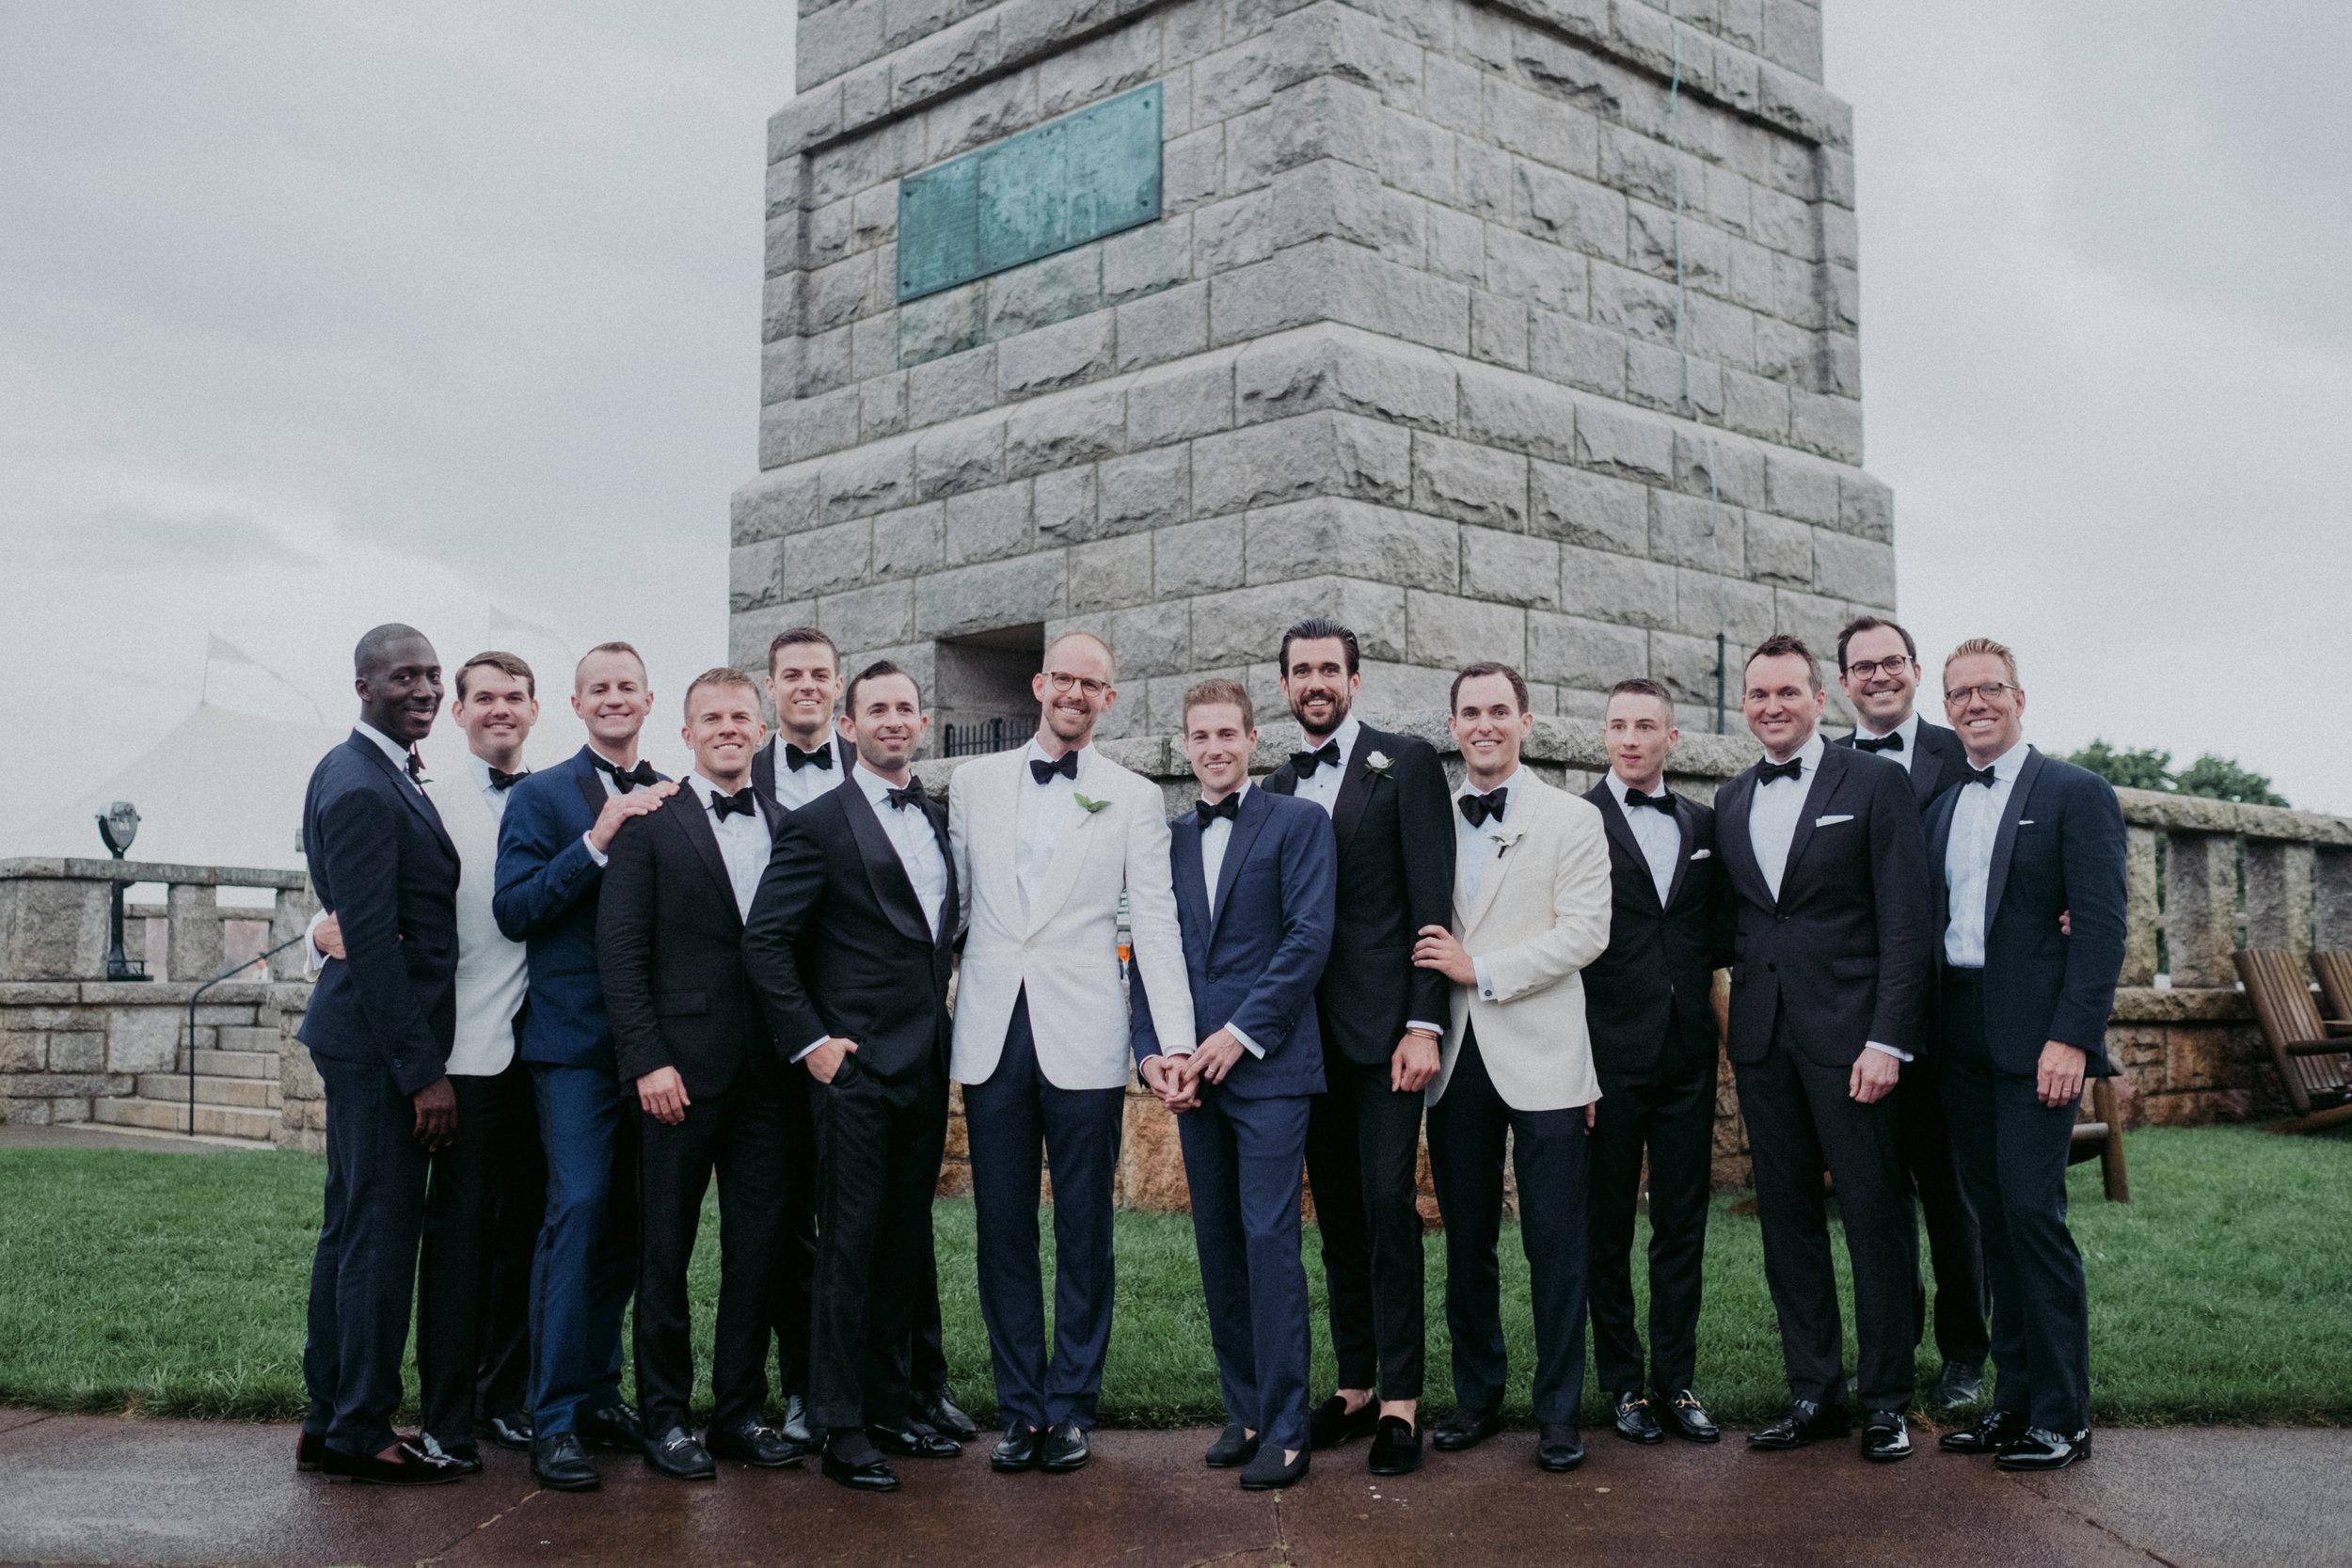 Same Sex Wedding in Provincetown, MA. Destination wedding planned by Nicole Simeral. Coastal Chic Wedding, Travel Wedding, Sperry Sailcloth Tent Wedding.  Getting Ready, Rain, Rainbow, Miracle